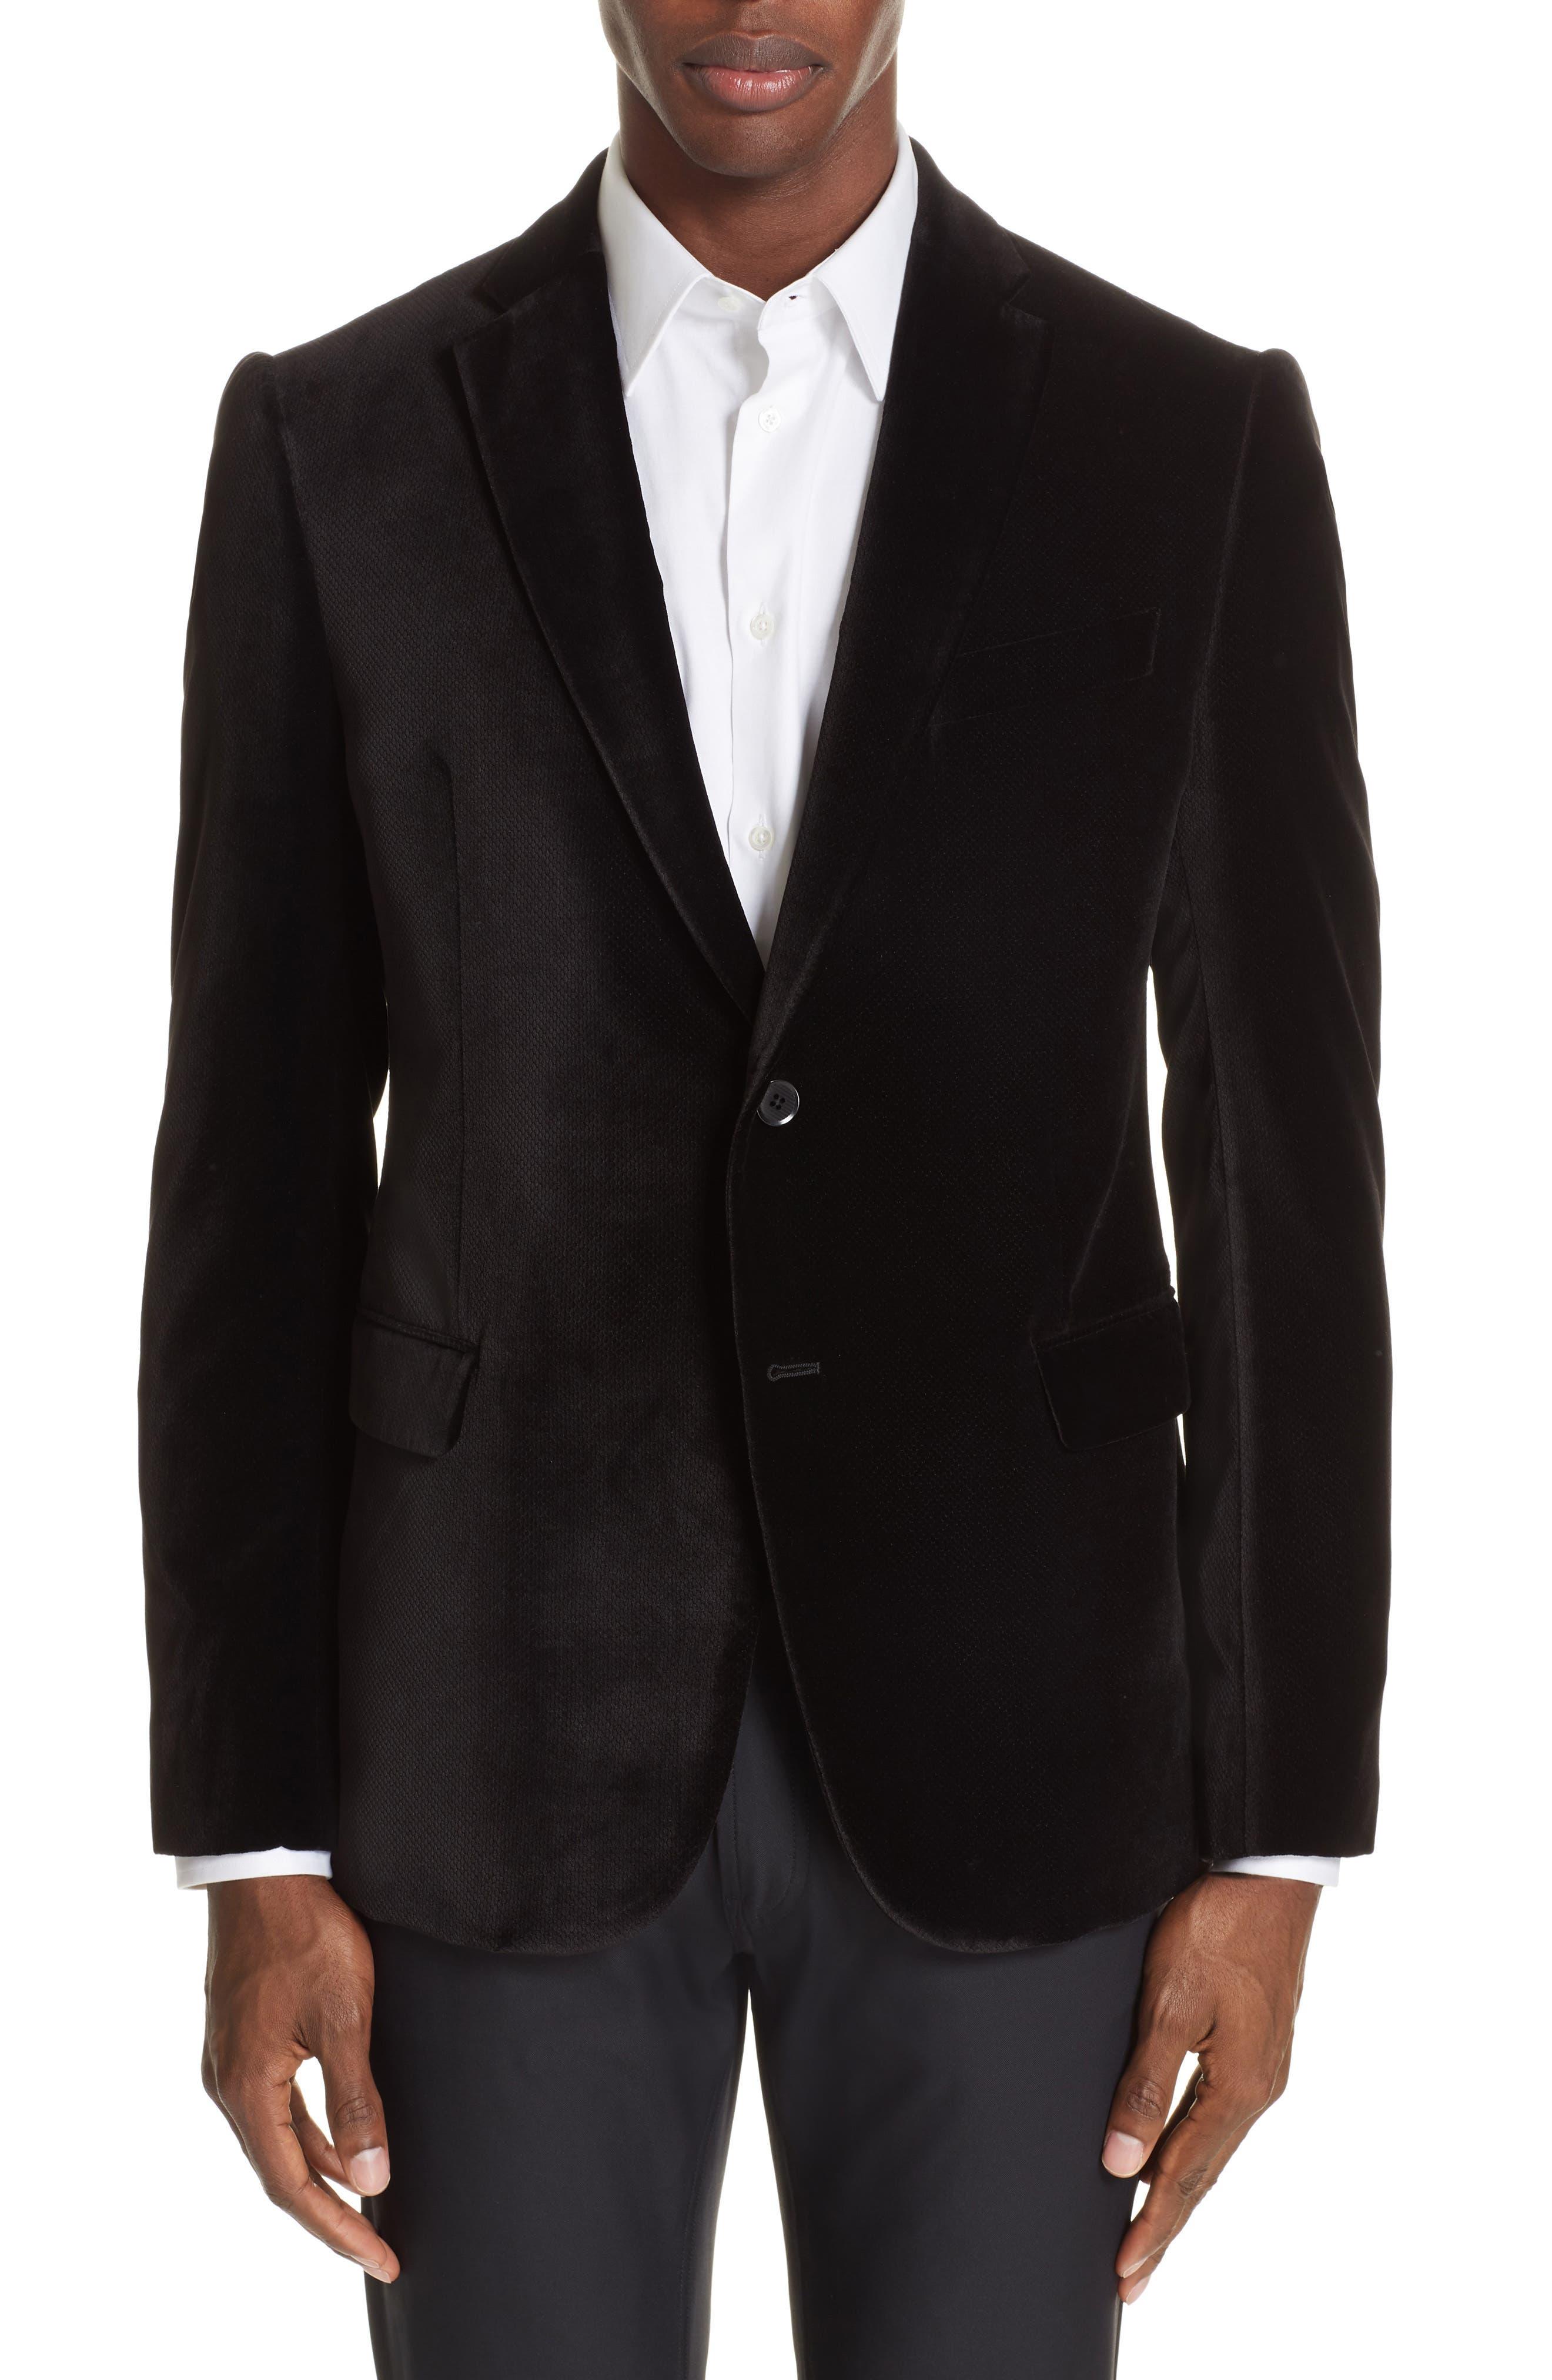 G-Line Trim Fit Velvet Blazer,                         Main,                         color, BLACK